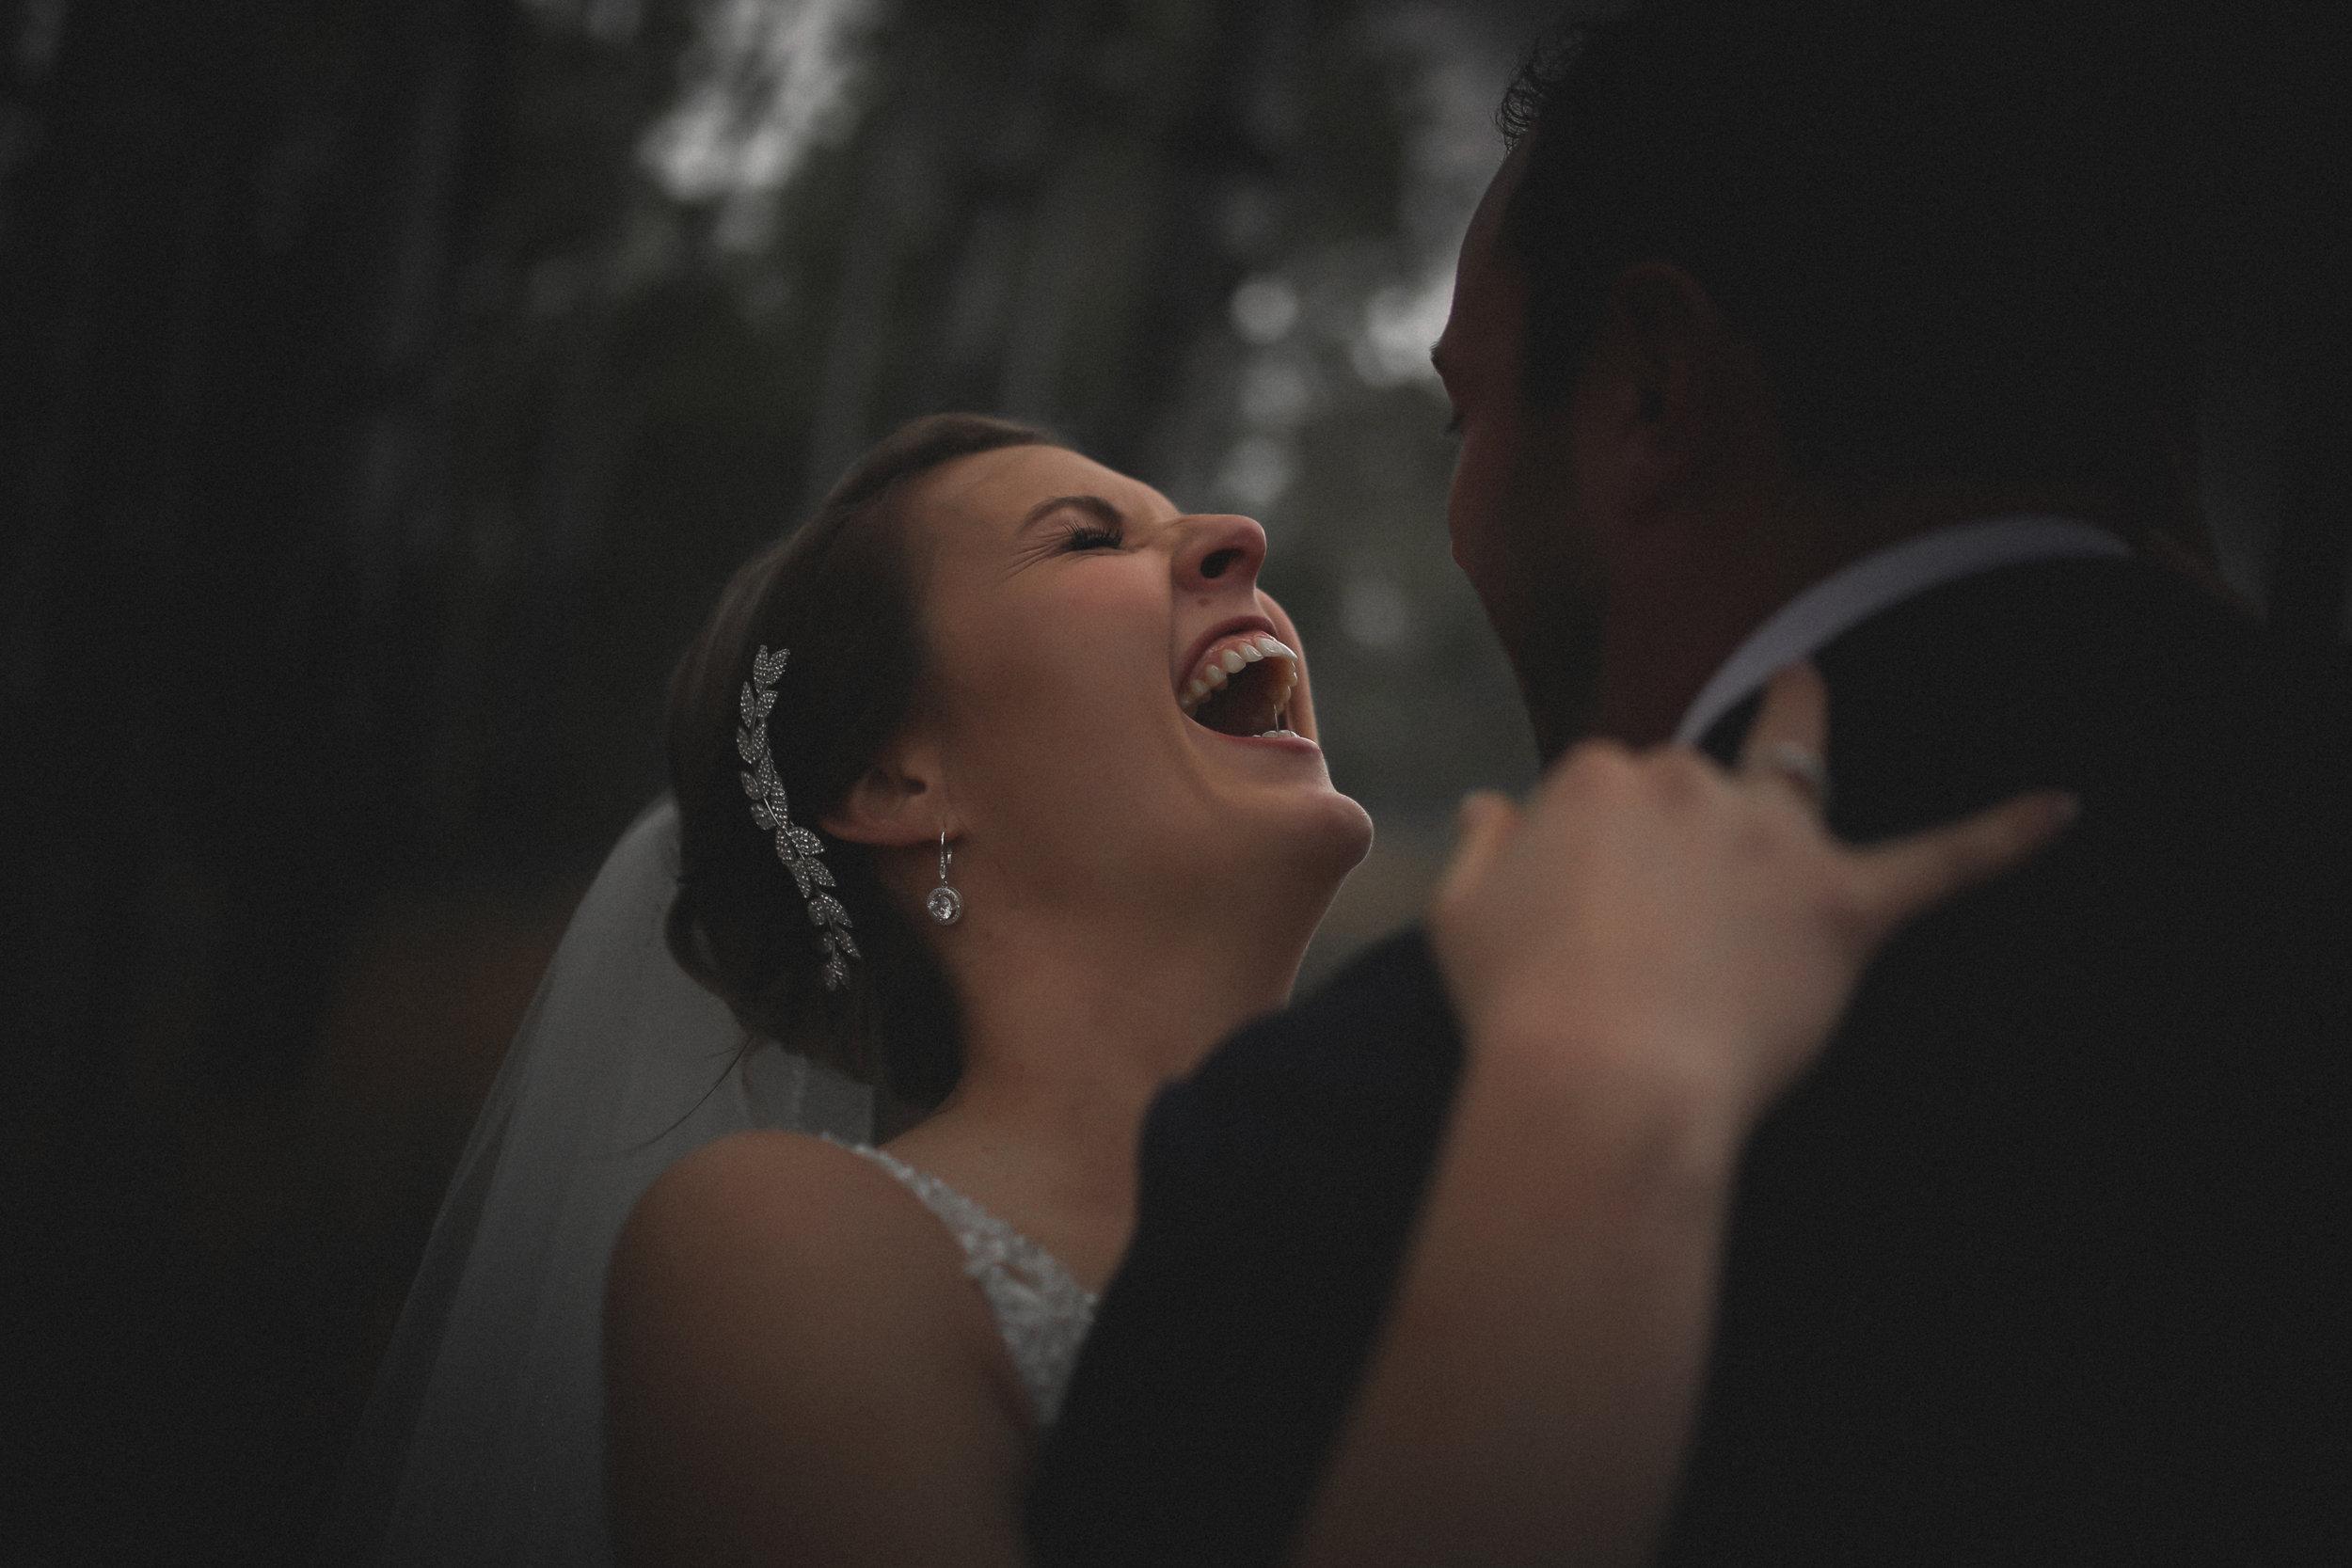 19 Adam Ziorio Photography - Vitoria wedding photographer Nick&Bree Fernie Wedding.jpg